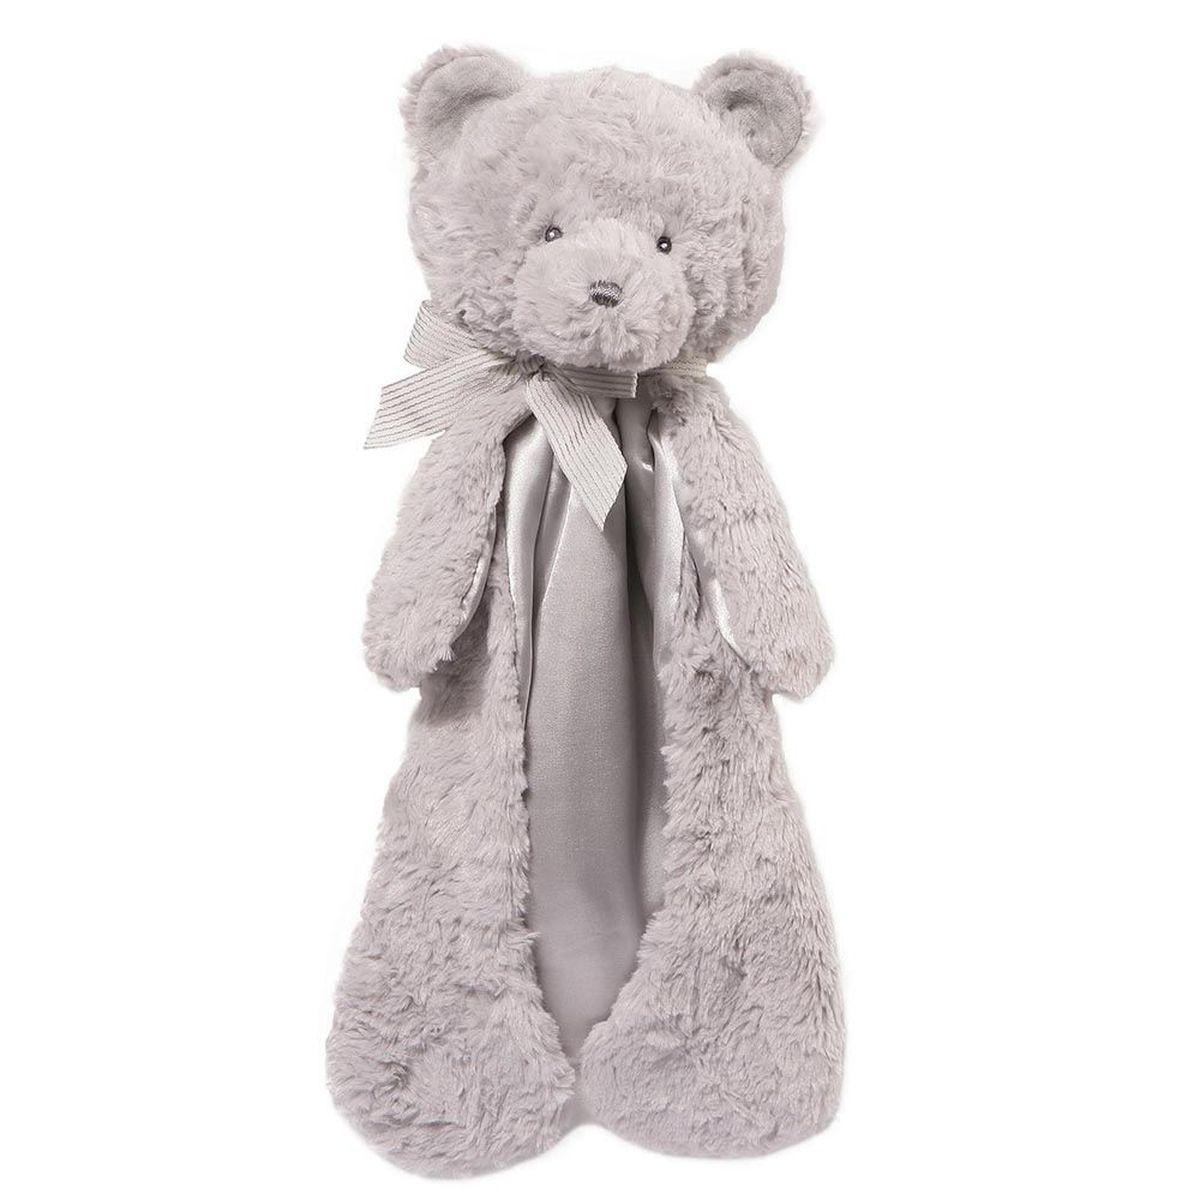 Gund Мягкая игрушка Grayson Bear Huggybuddy 43 см мягкая игрушка steiff paddington bear